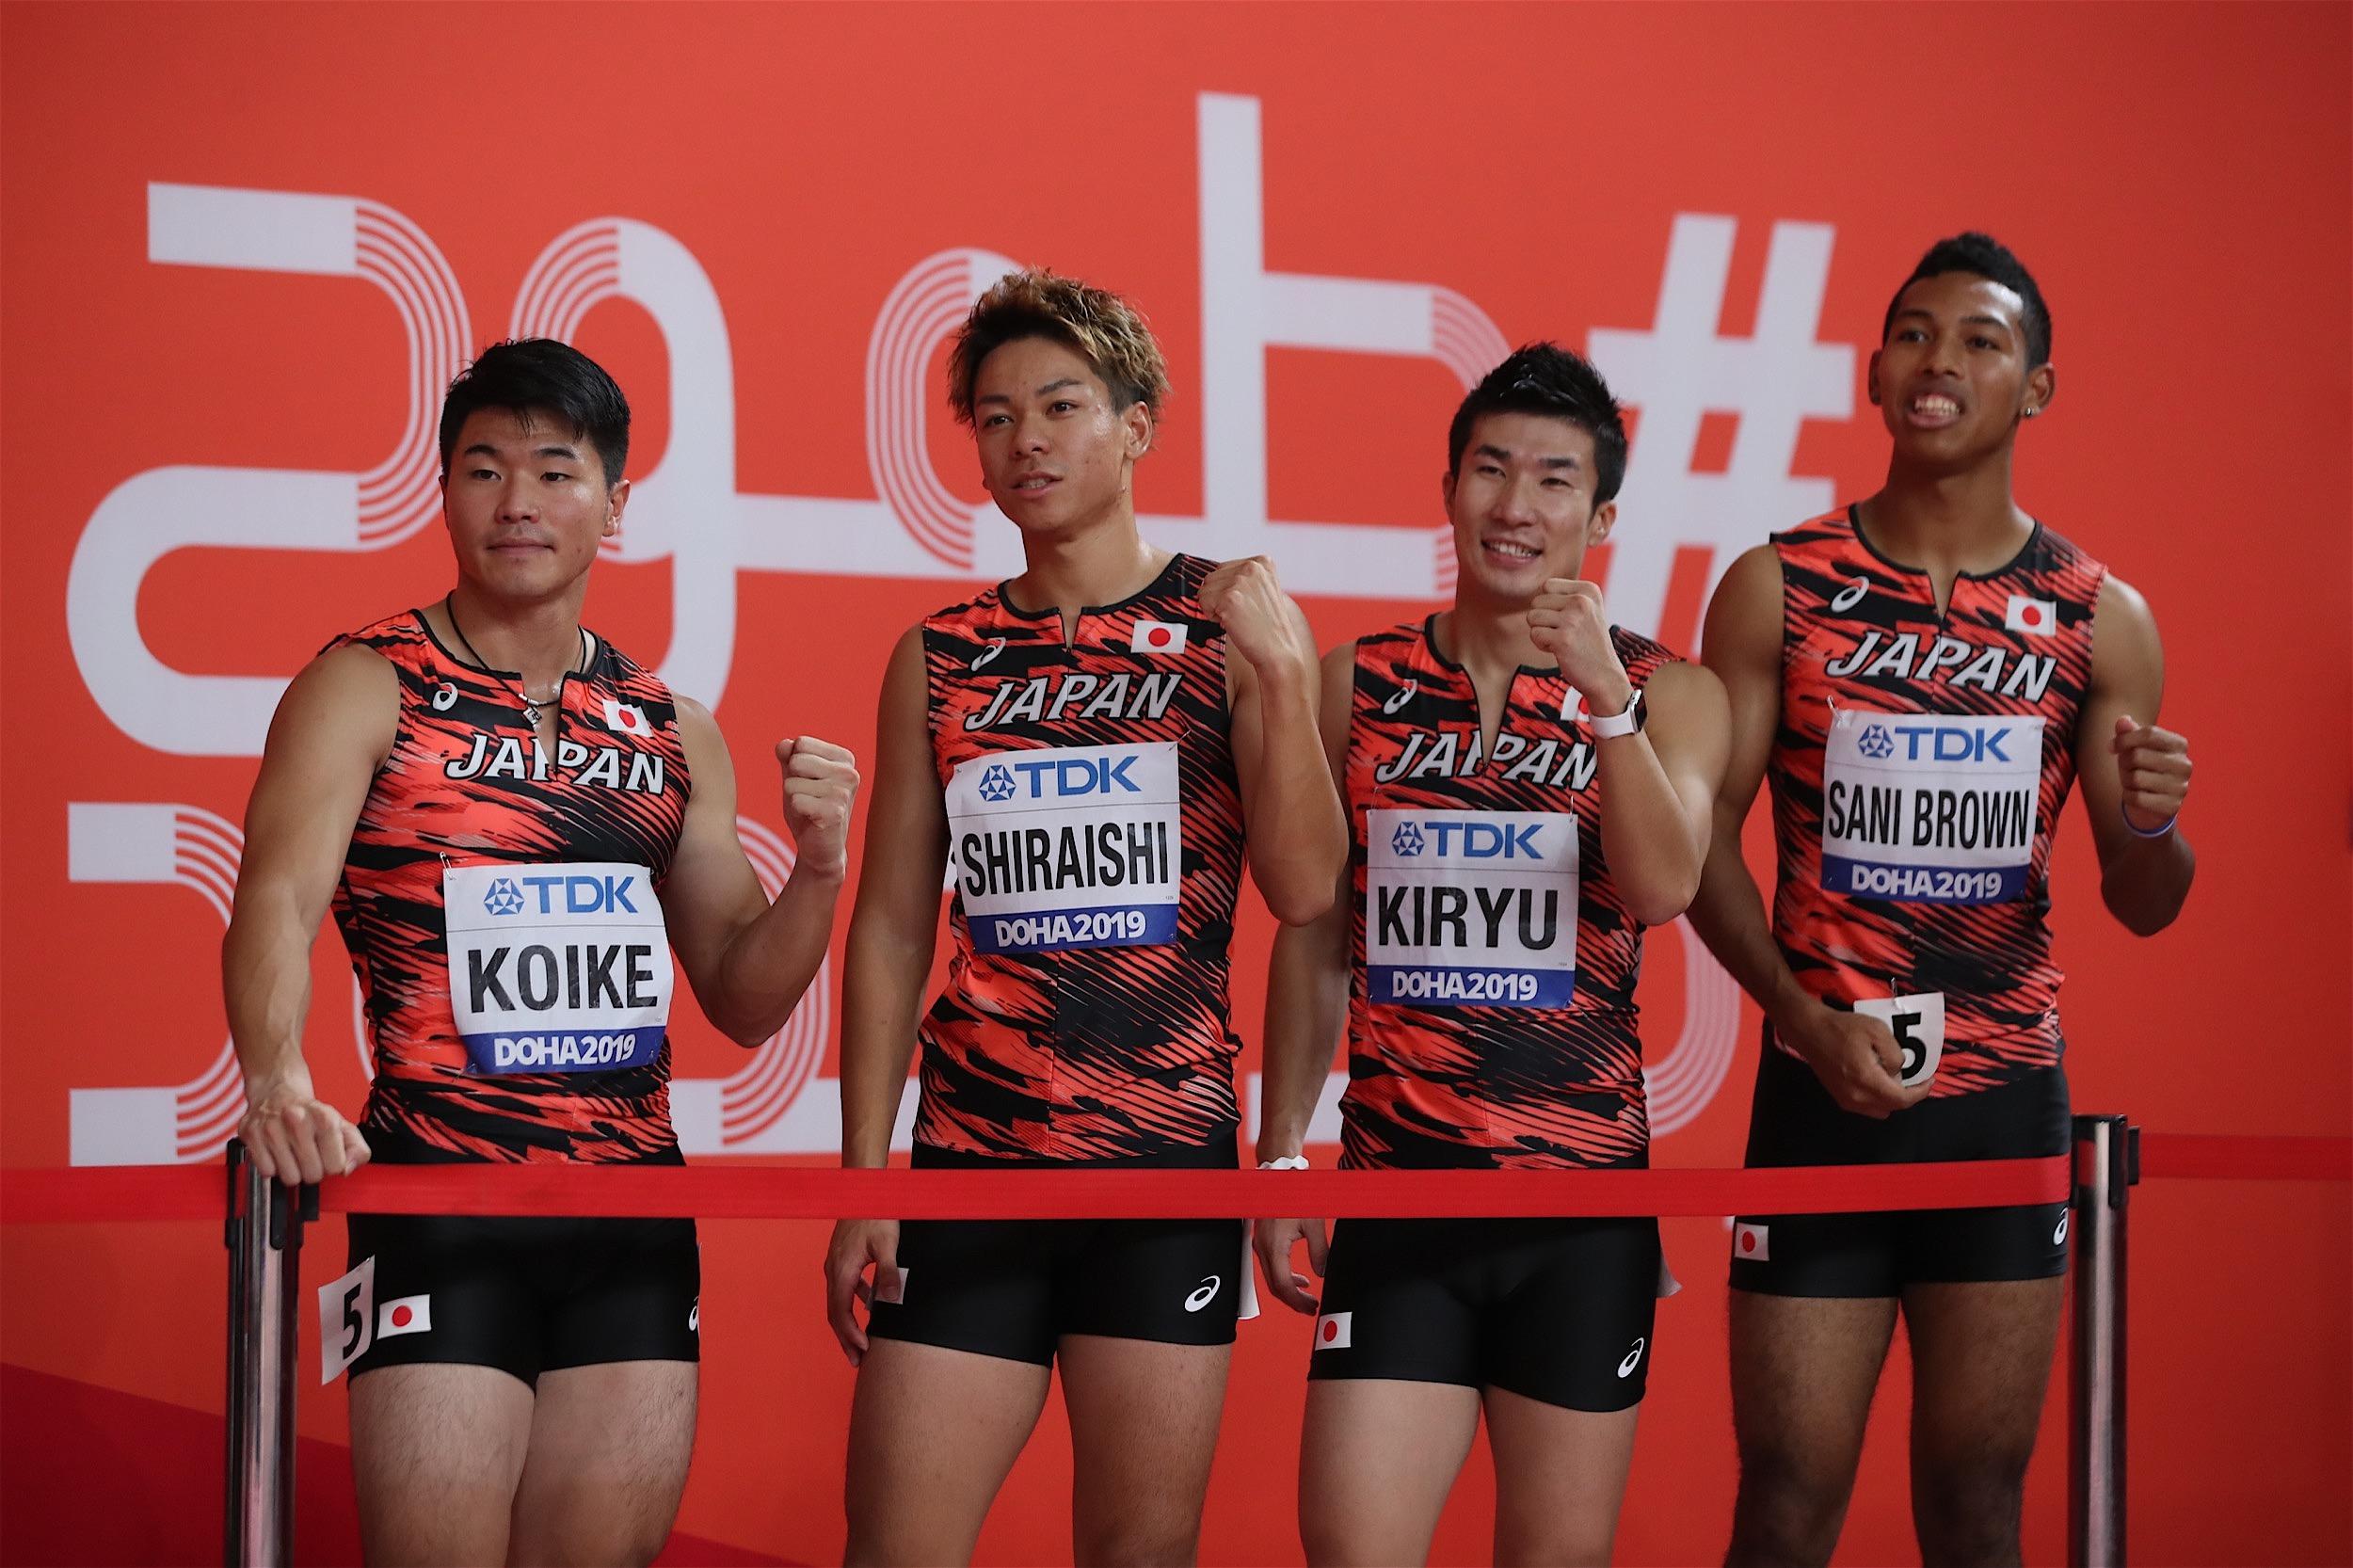 【Headline】世界選手権日本人全成績、北口榛花がJAL、山下潤がANAへ